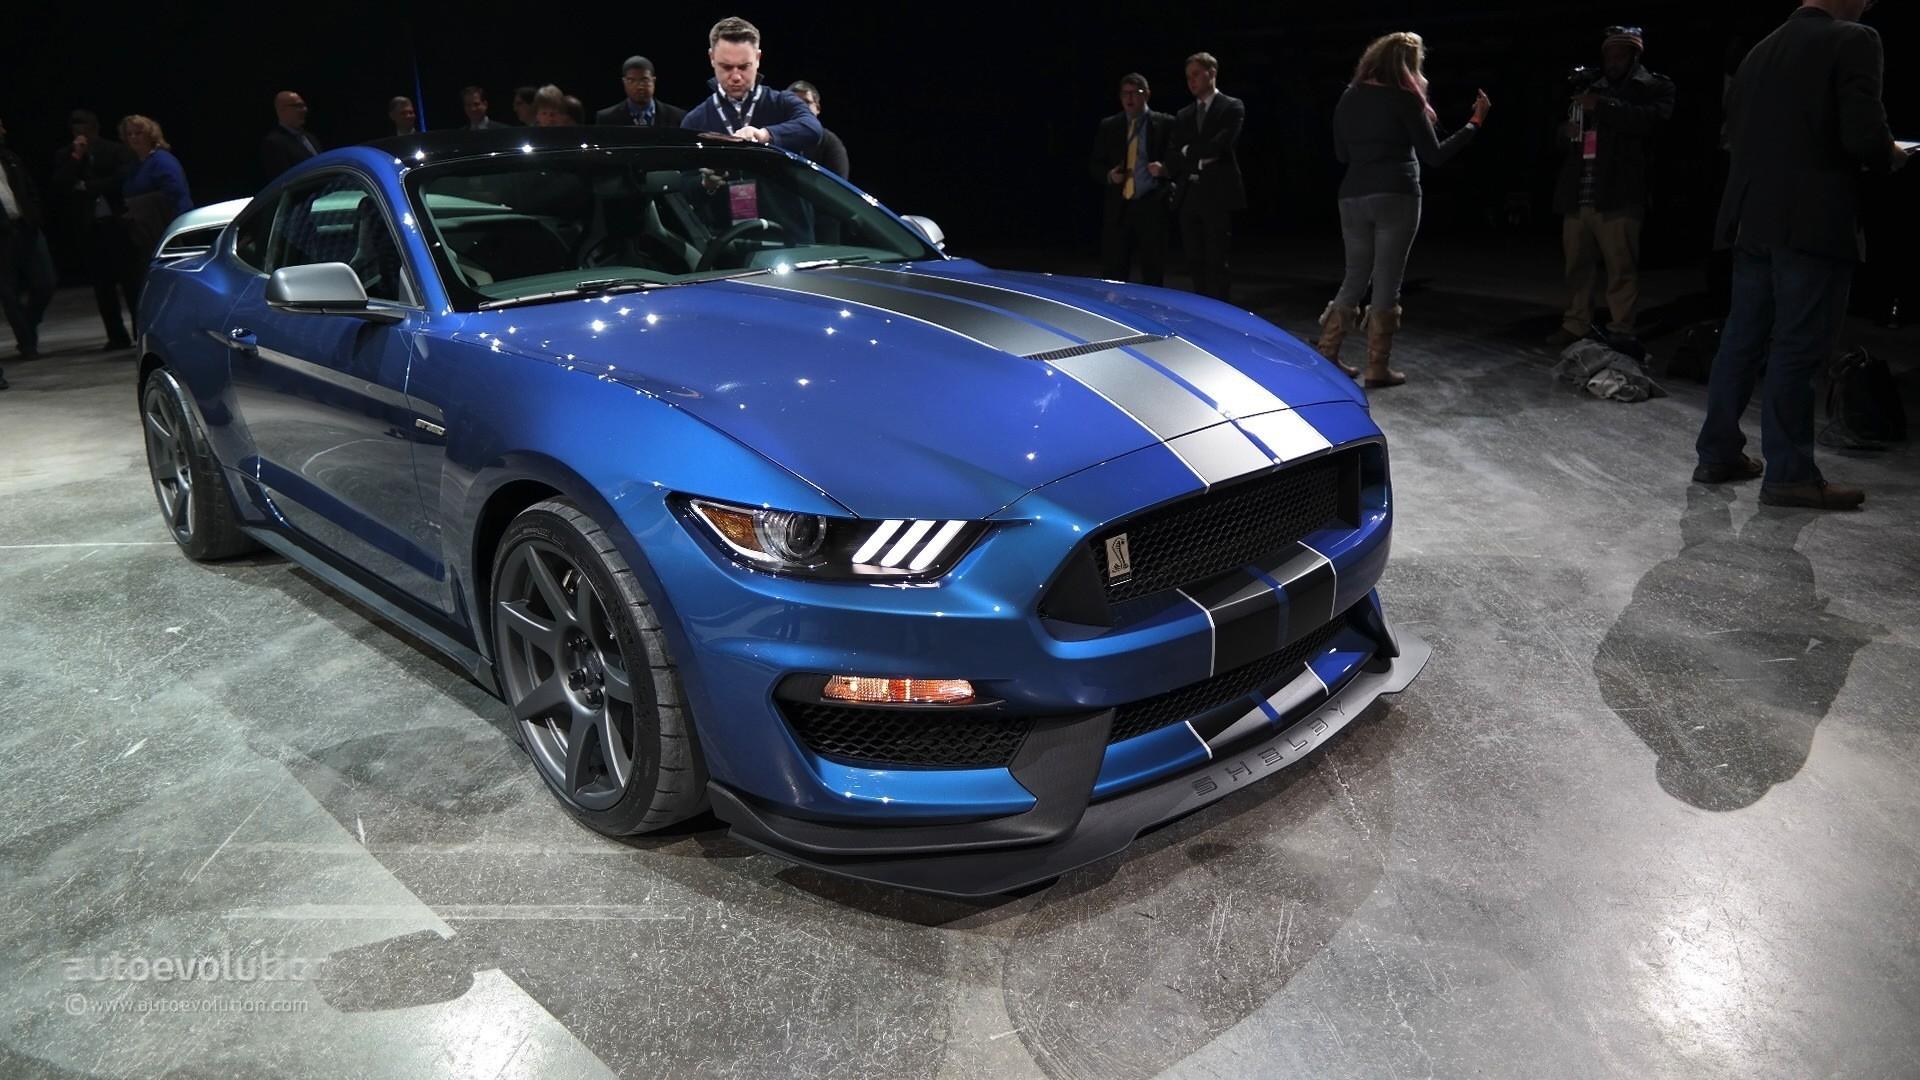 2016 Shelby Gt350 Mustang Develops 526 Horsepower Video